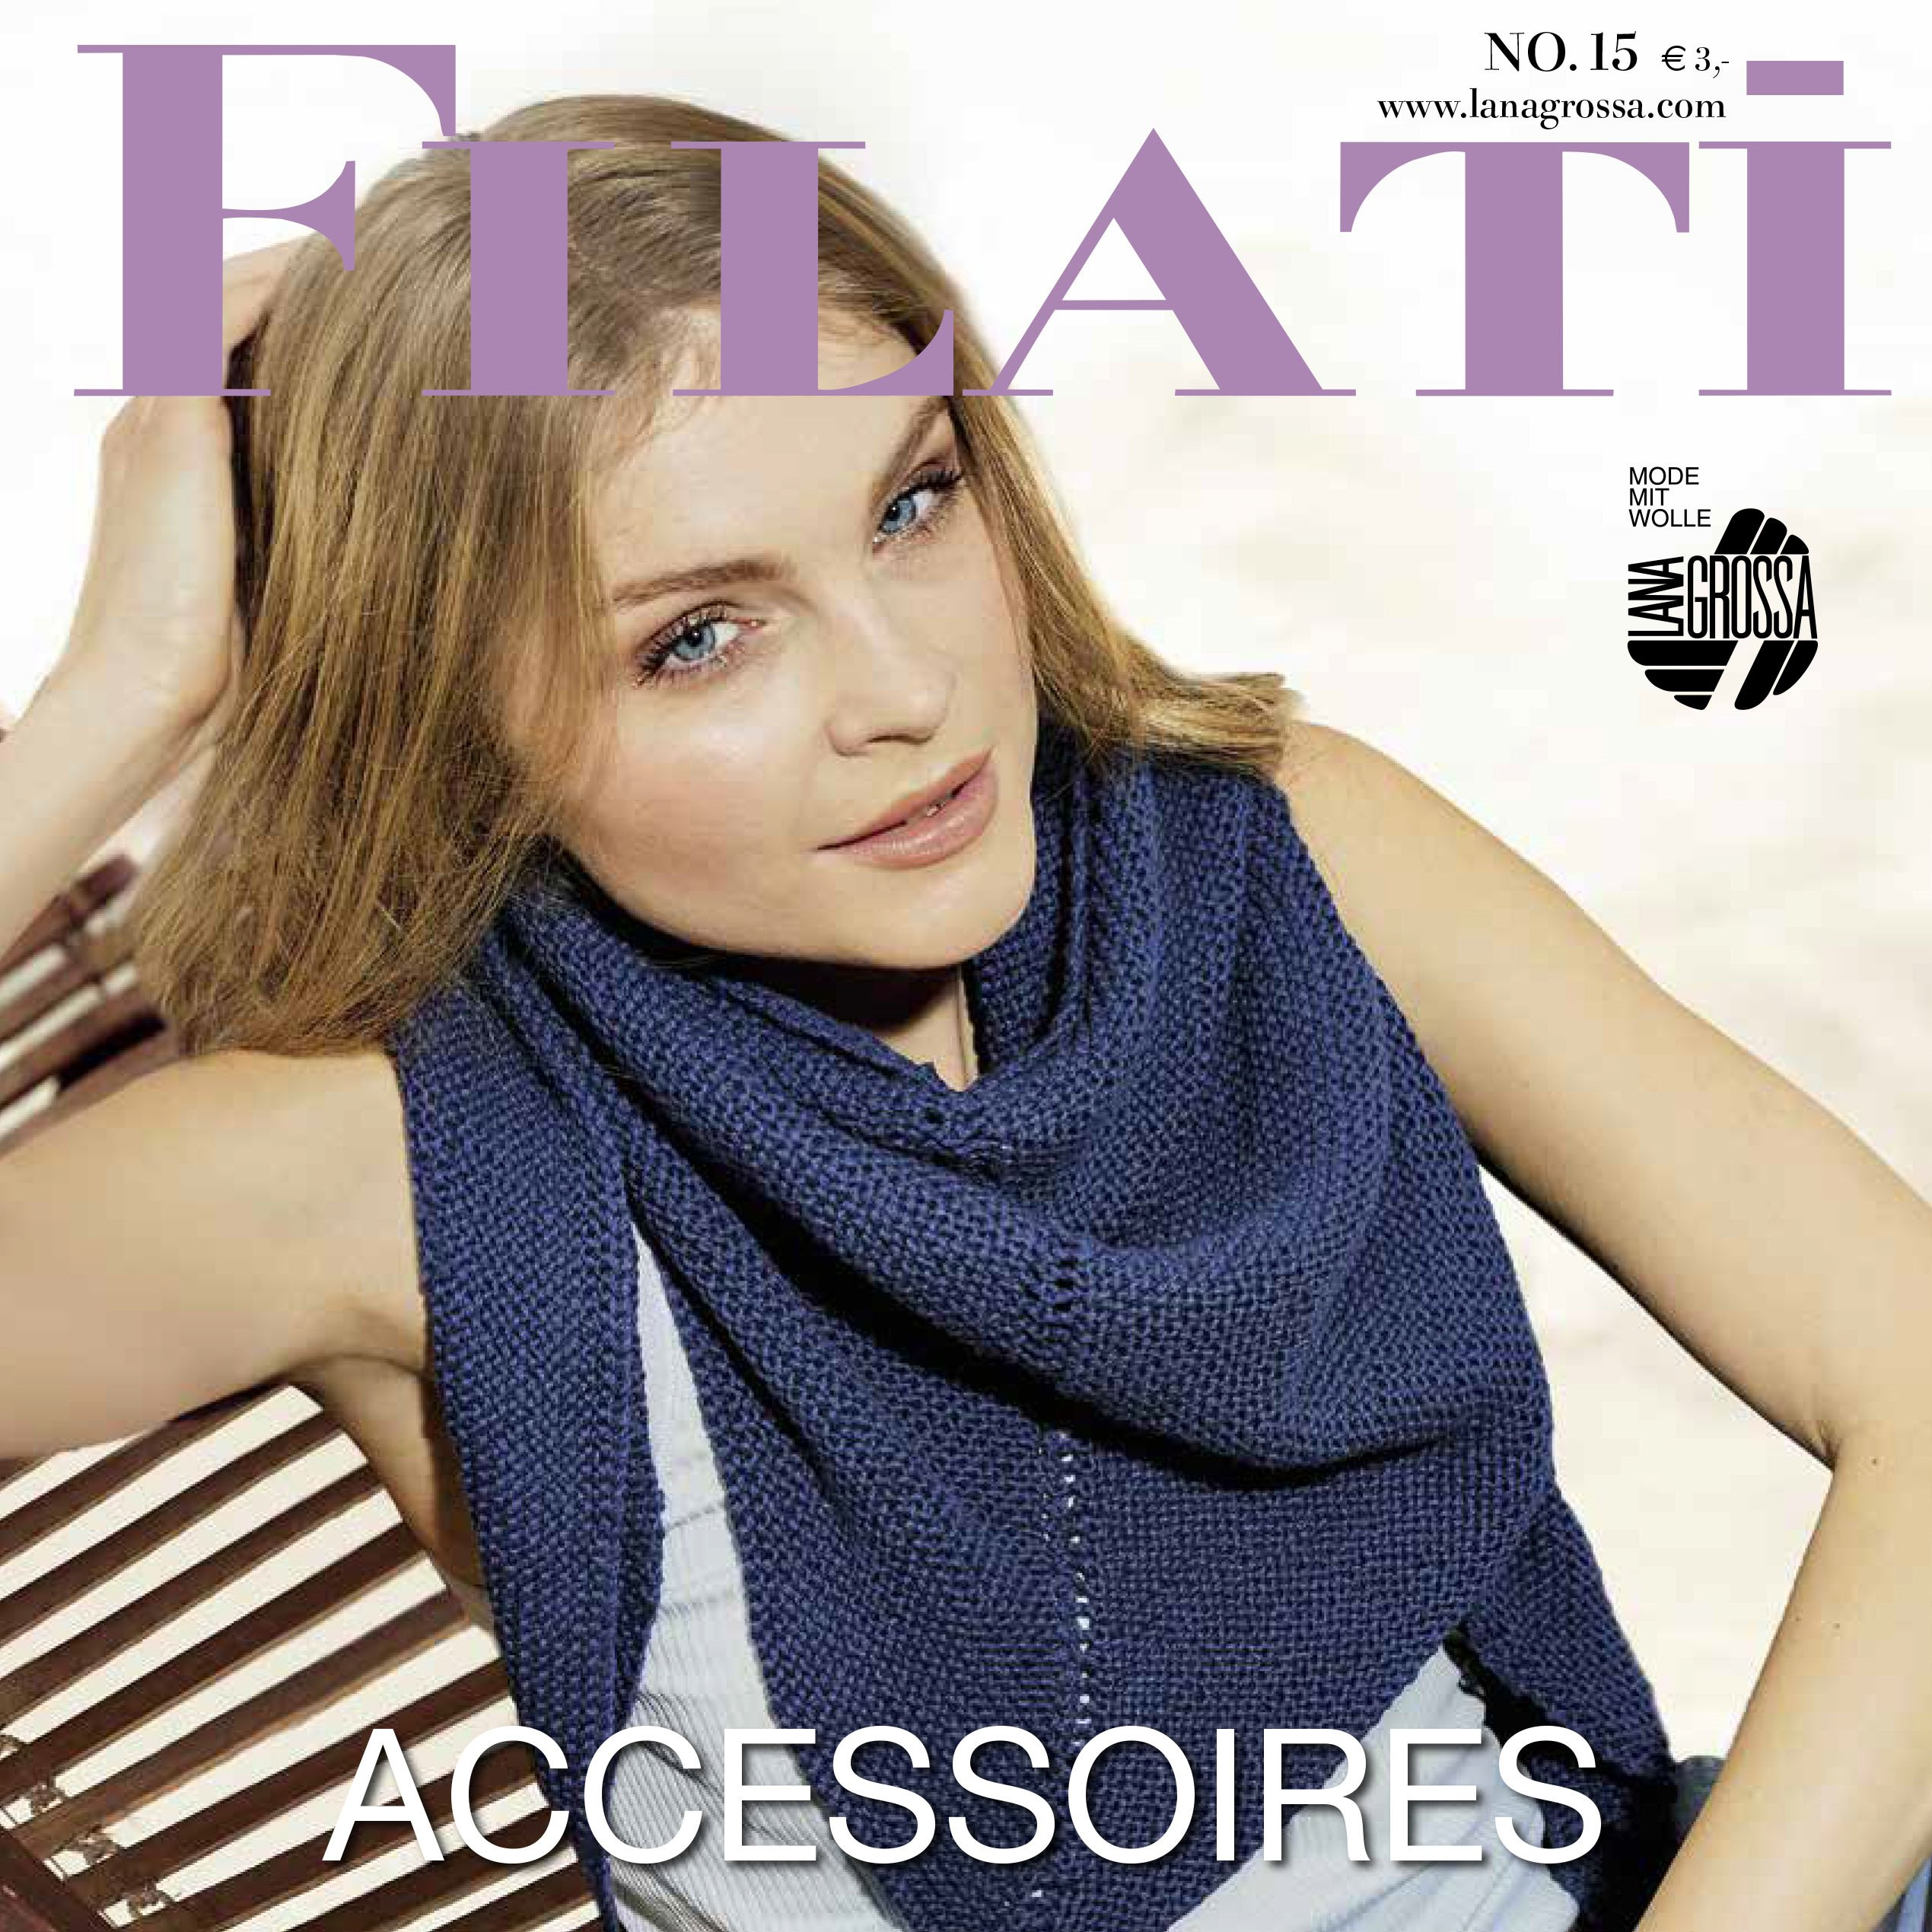 Lana Grossa FILATI Accessoires No. 15 - English Edition